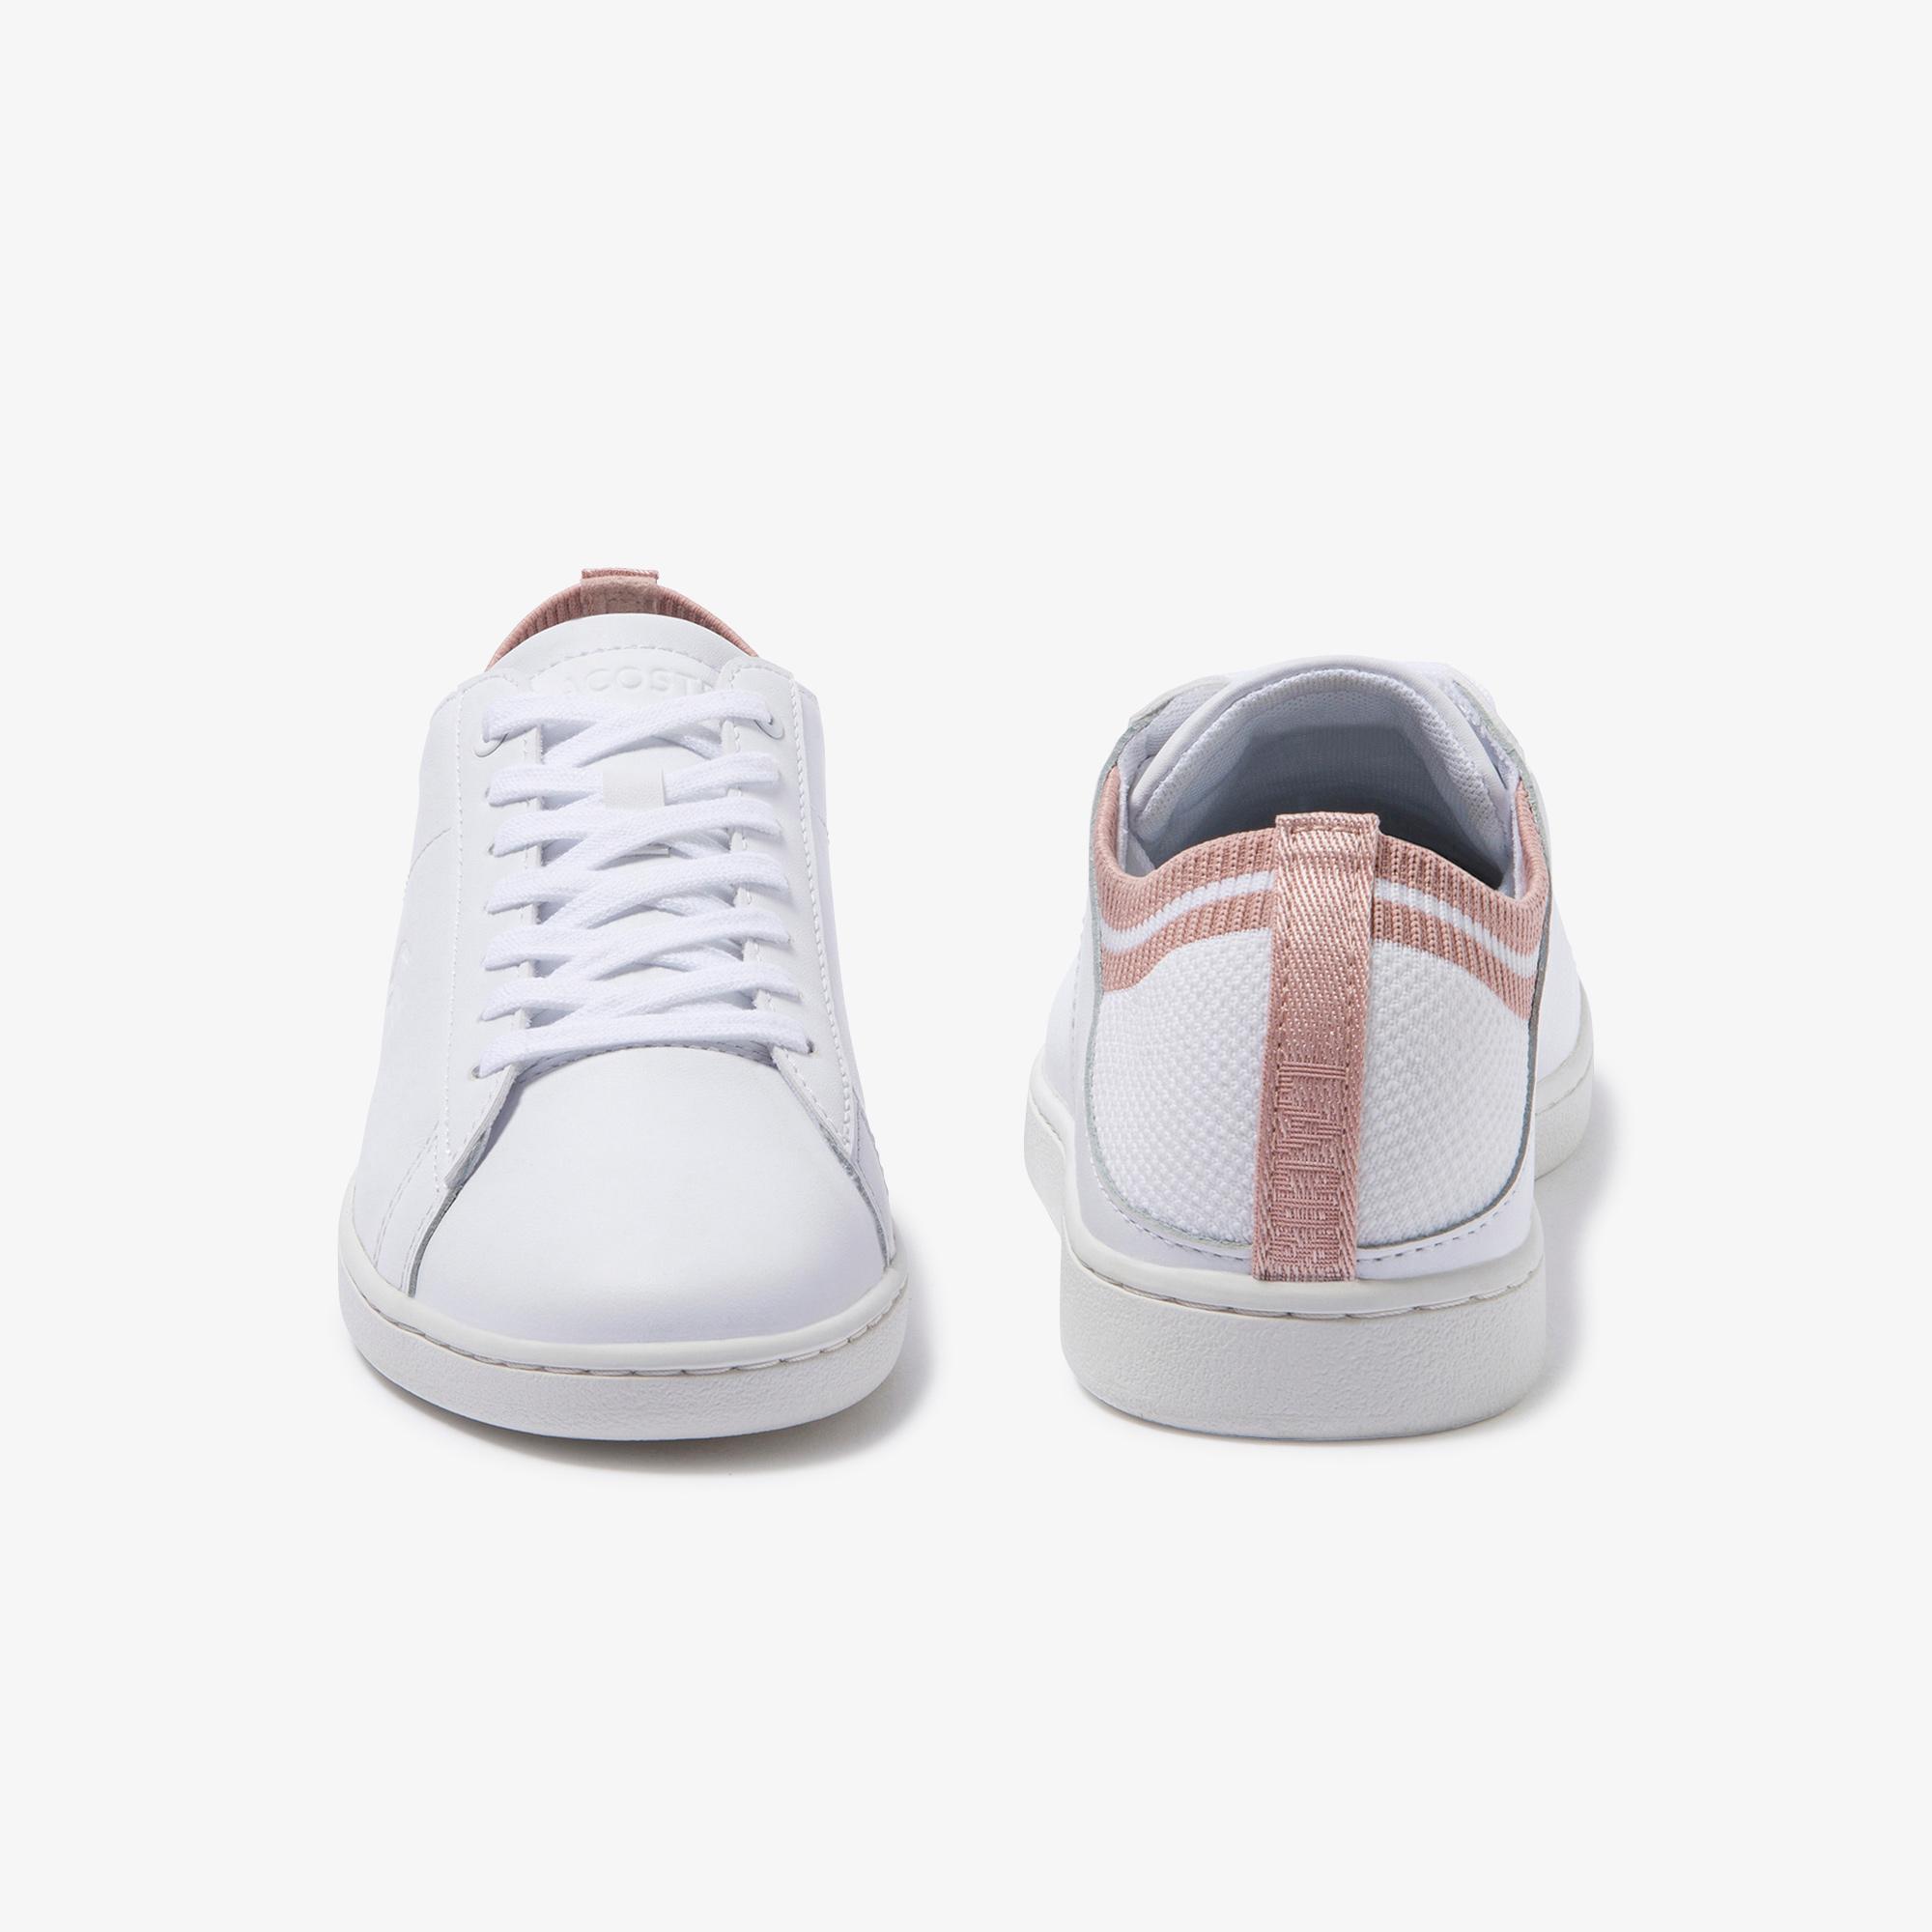 Lacoste Carnaby EVO Duo 120 1 Damskie Sneakersy